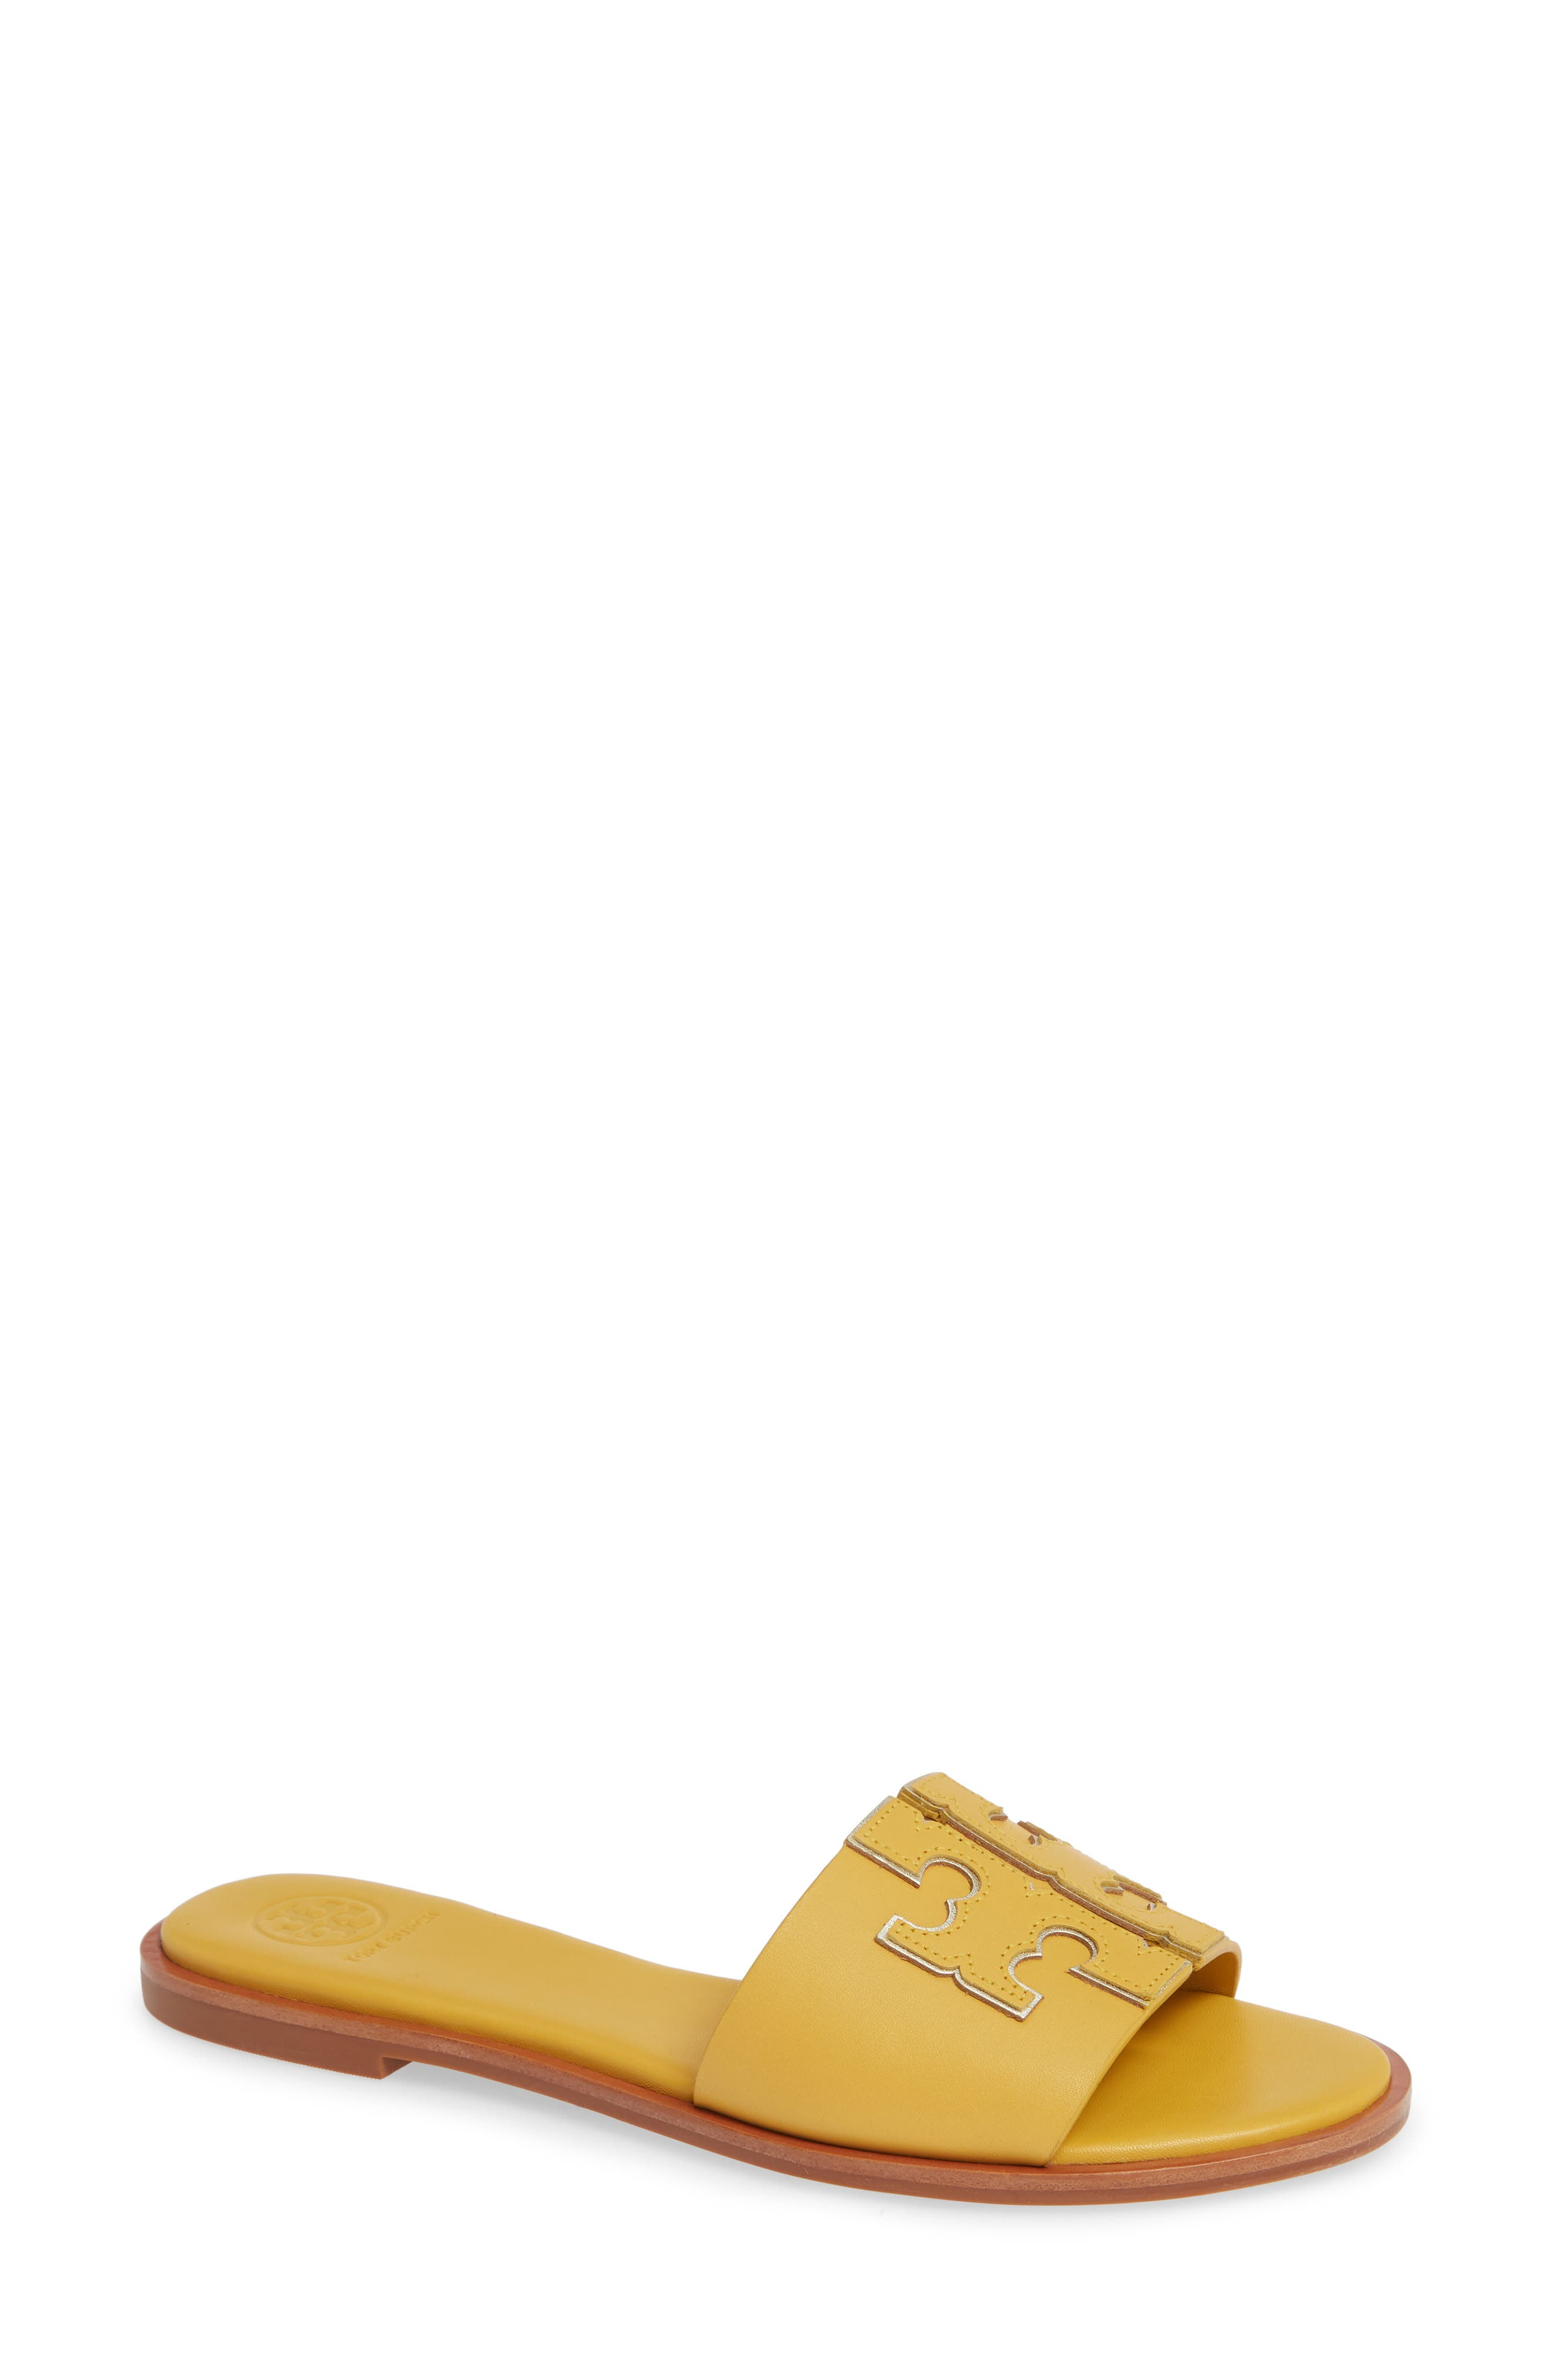 Tory Burch Ines Slide Sandal- Metallic